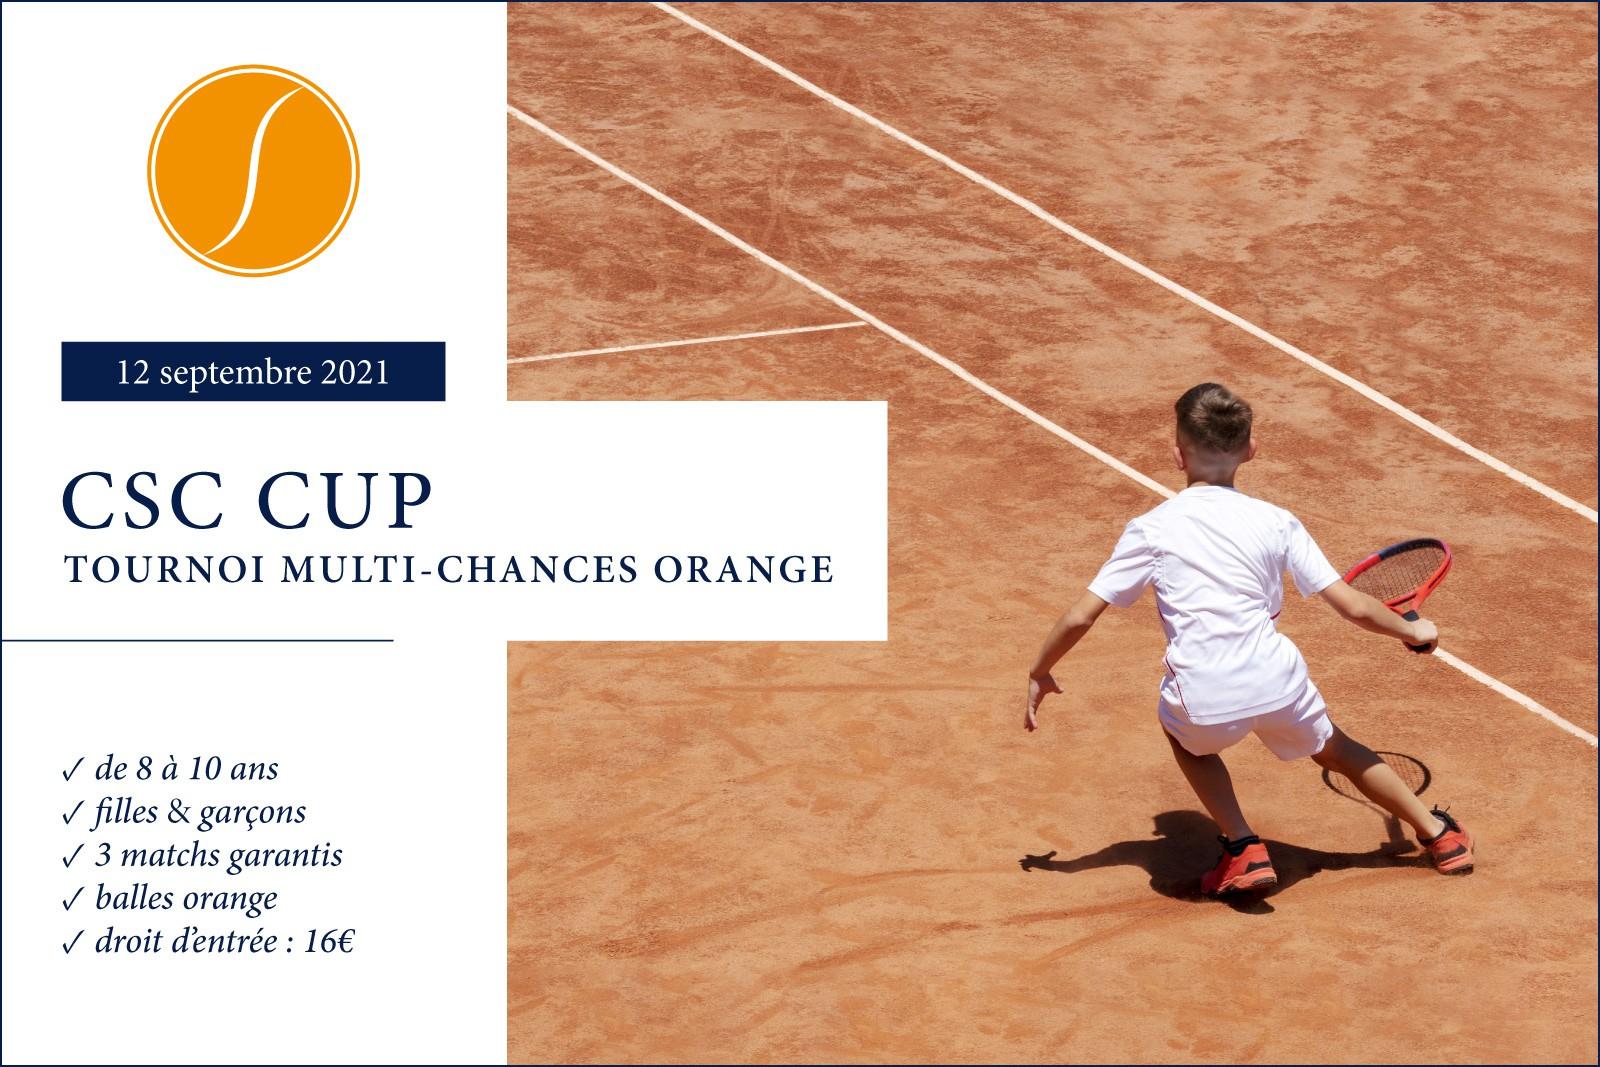 CSC CUP - TMC 8/10 ans Orange